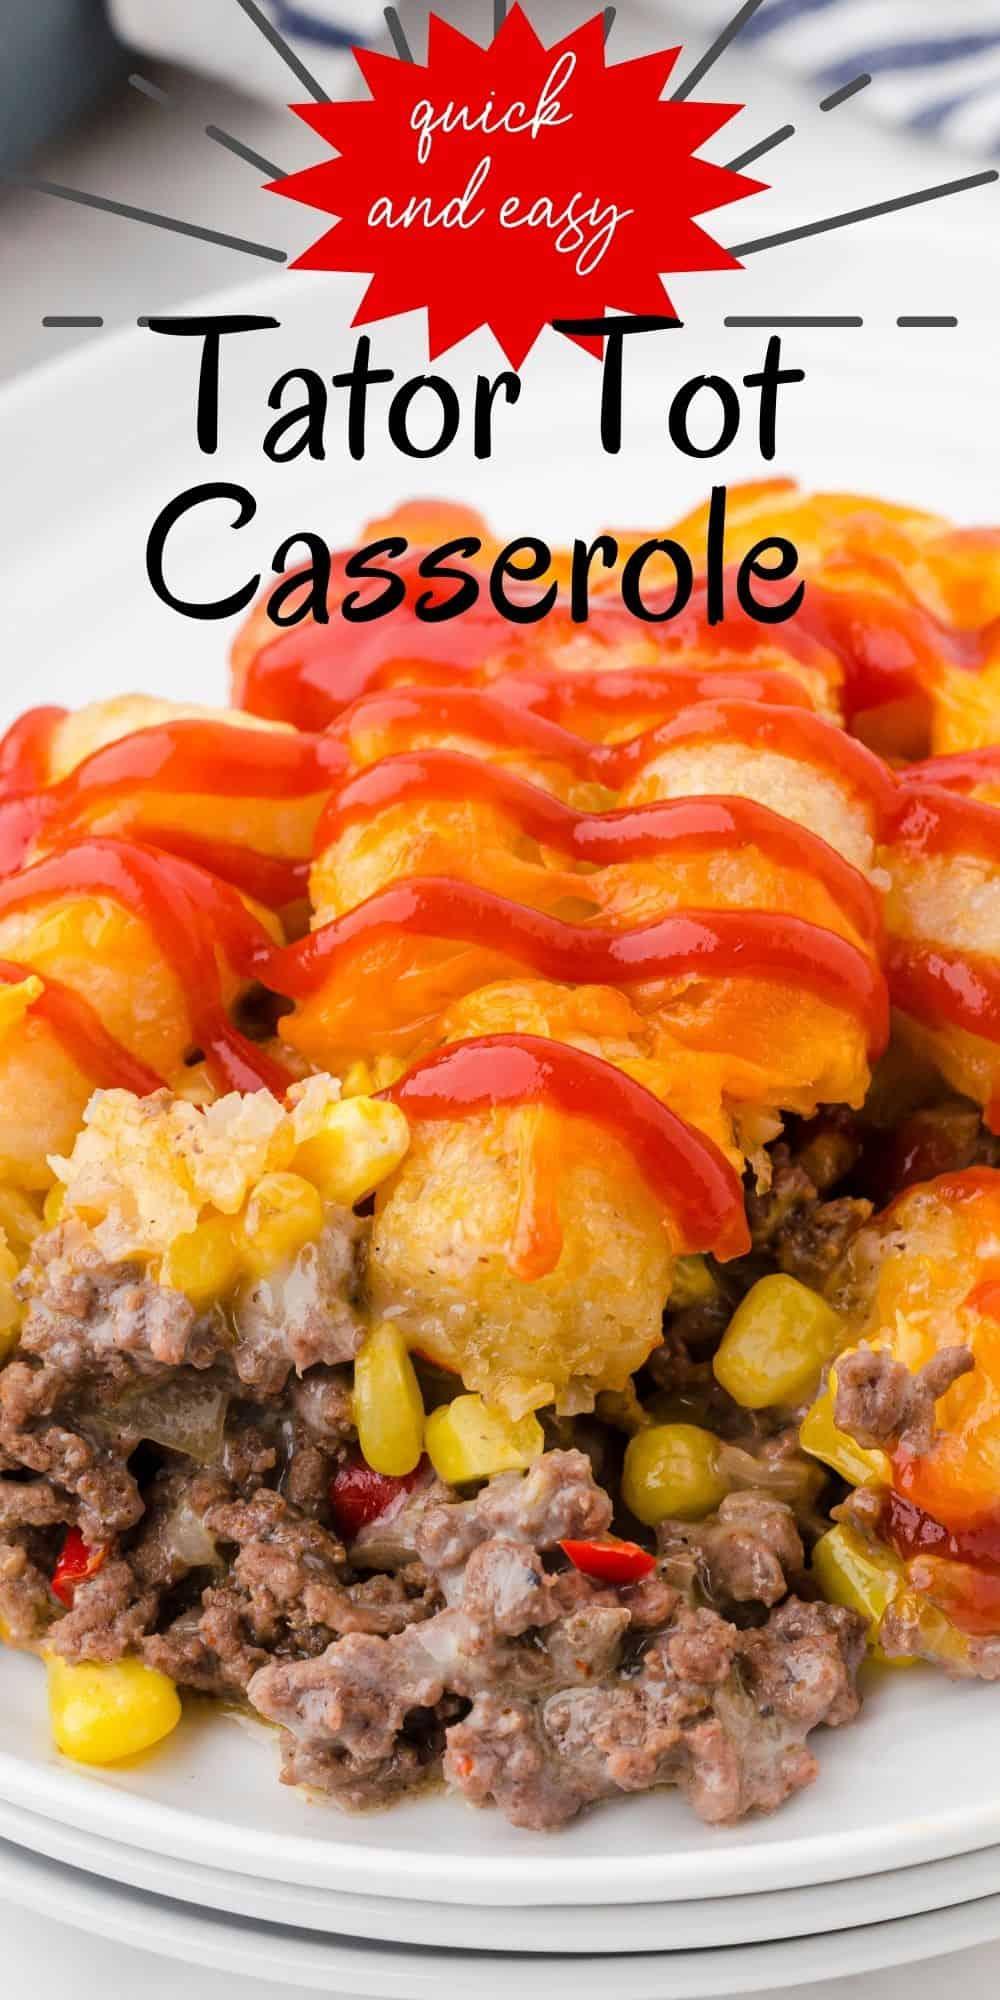 tator tot casserole dished up on a plate